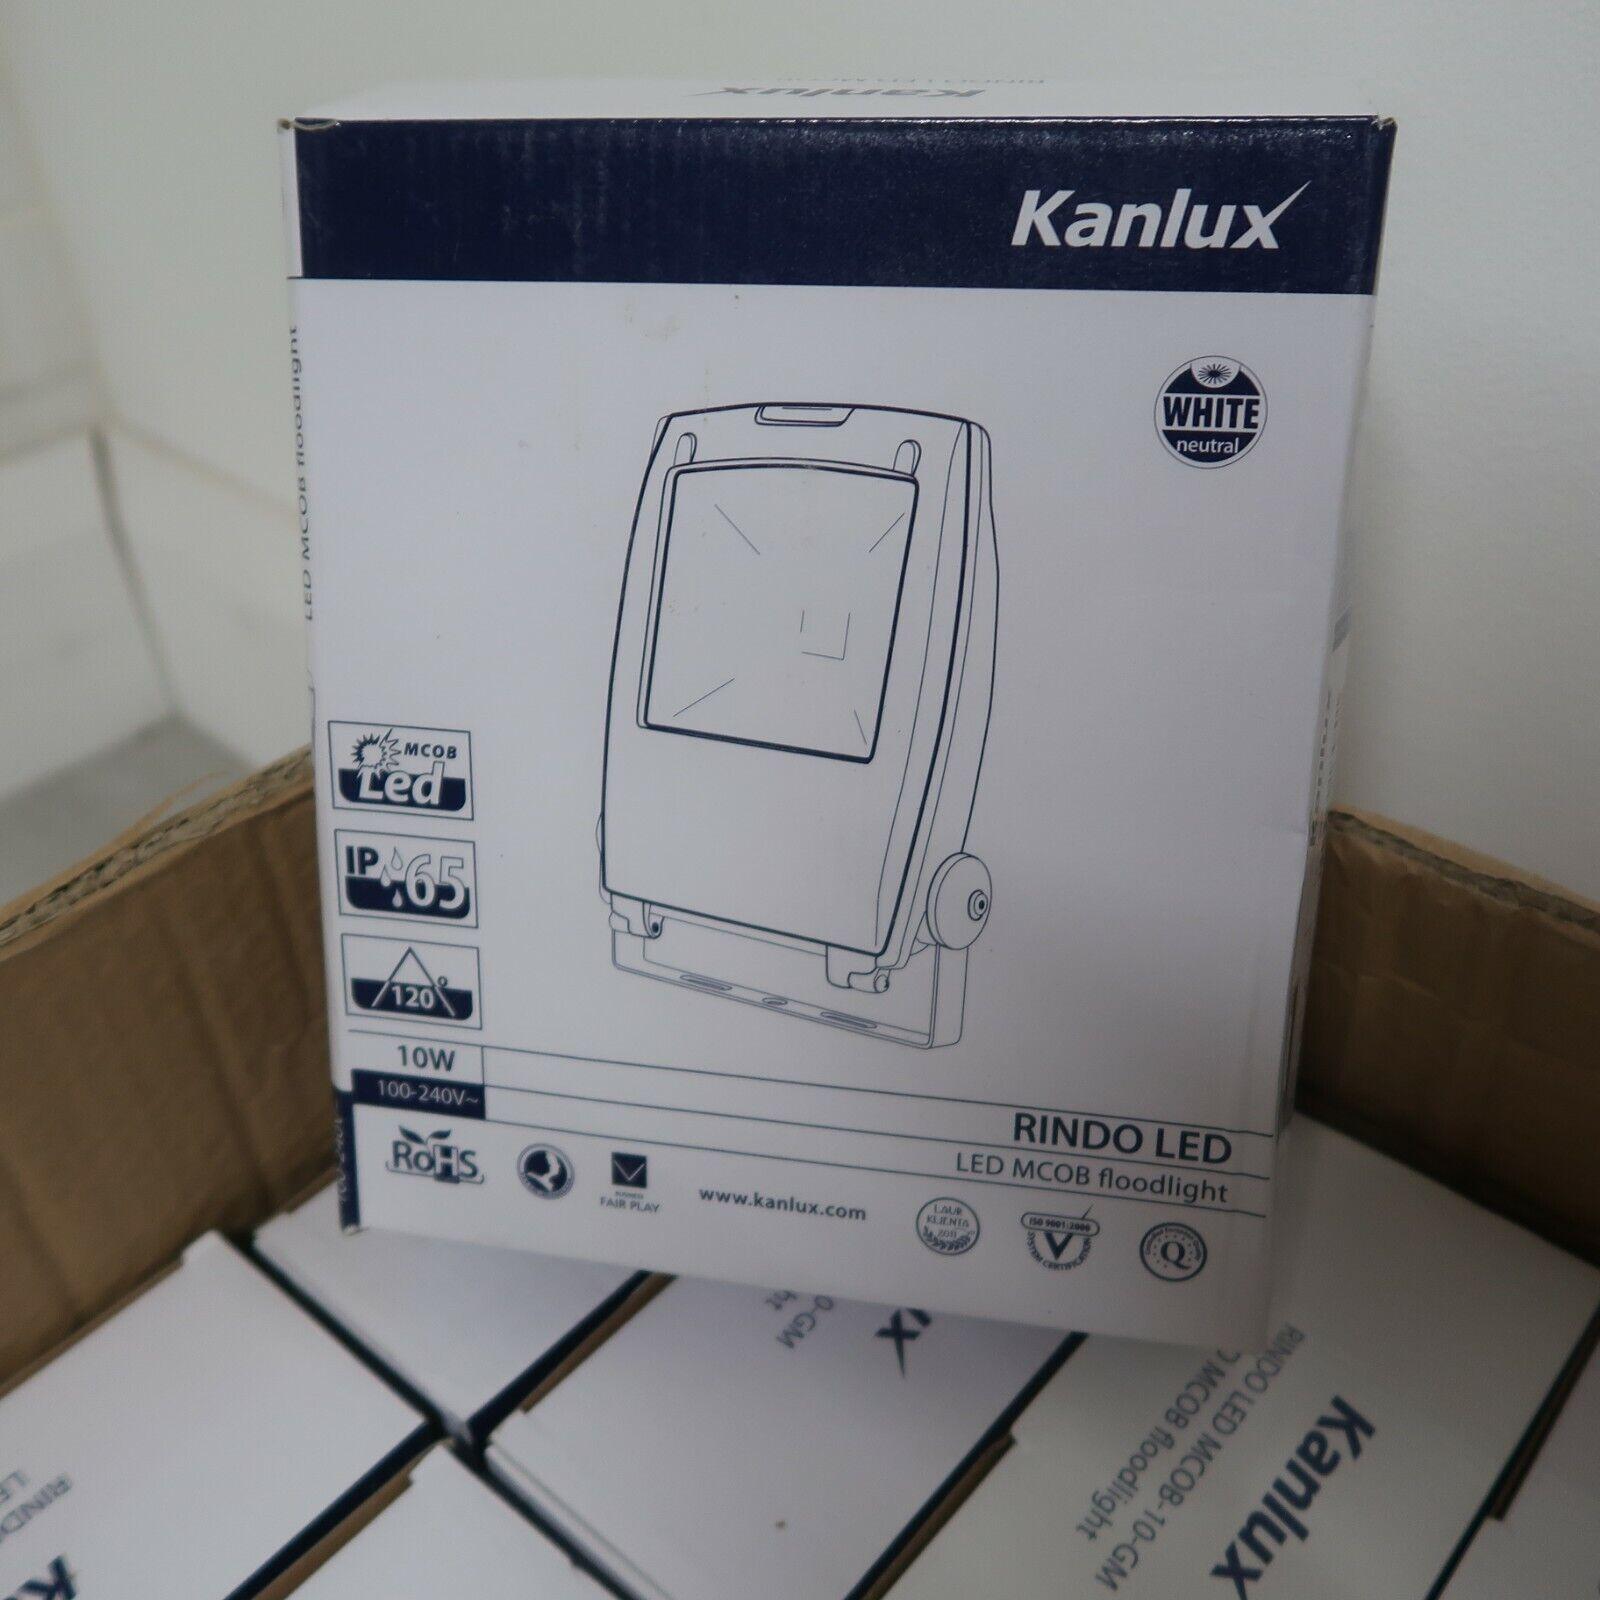 Kanlux RINDO LED Floodlight with motion sensor  MCOB Kanlux 10 Watts